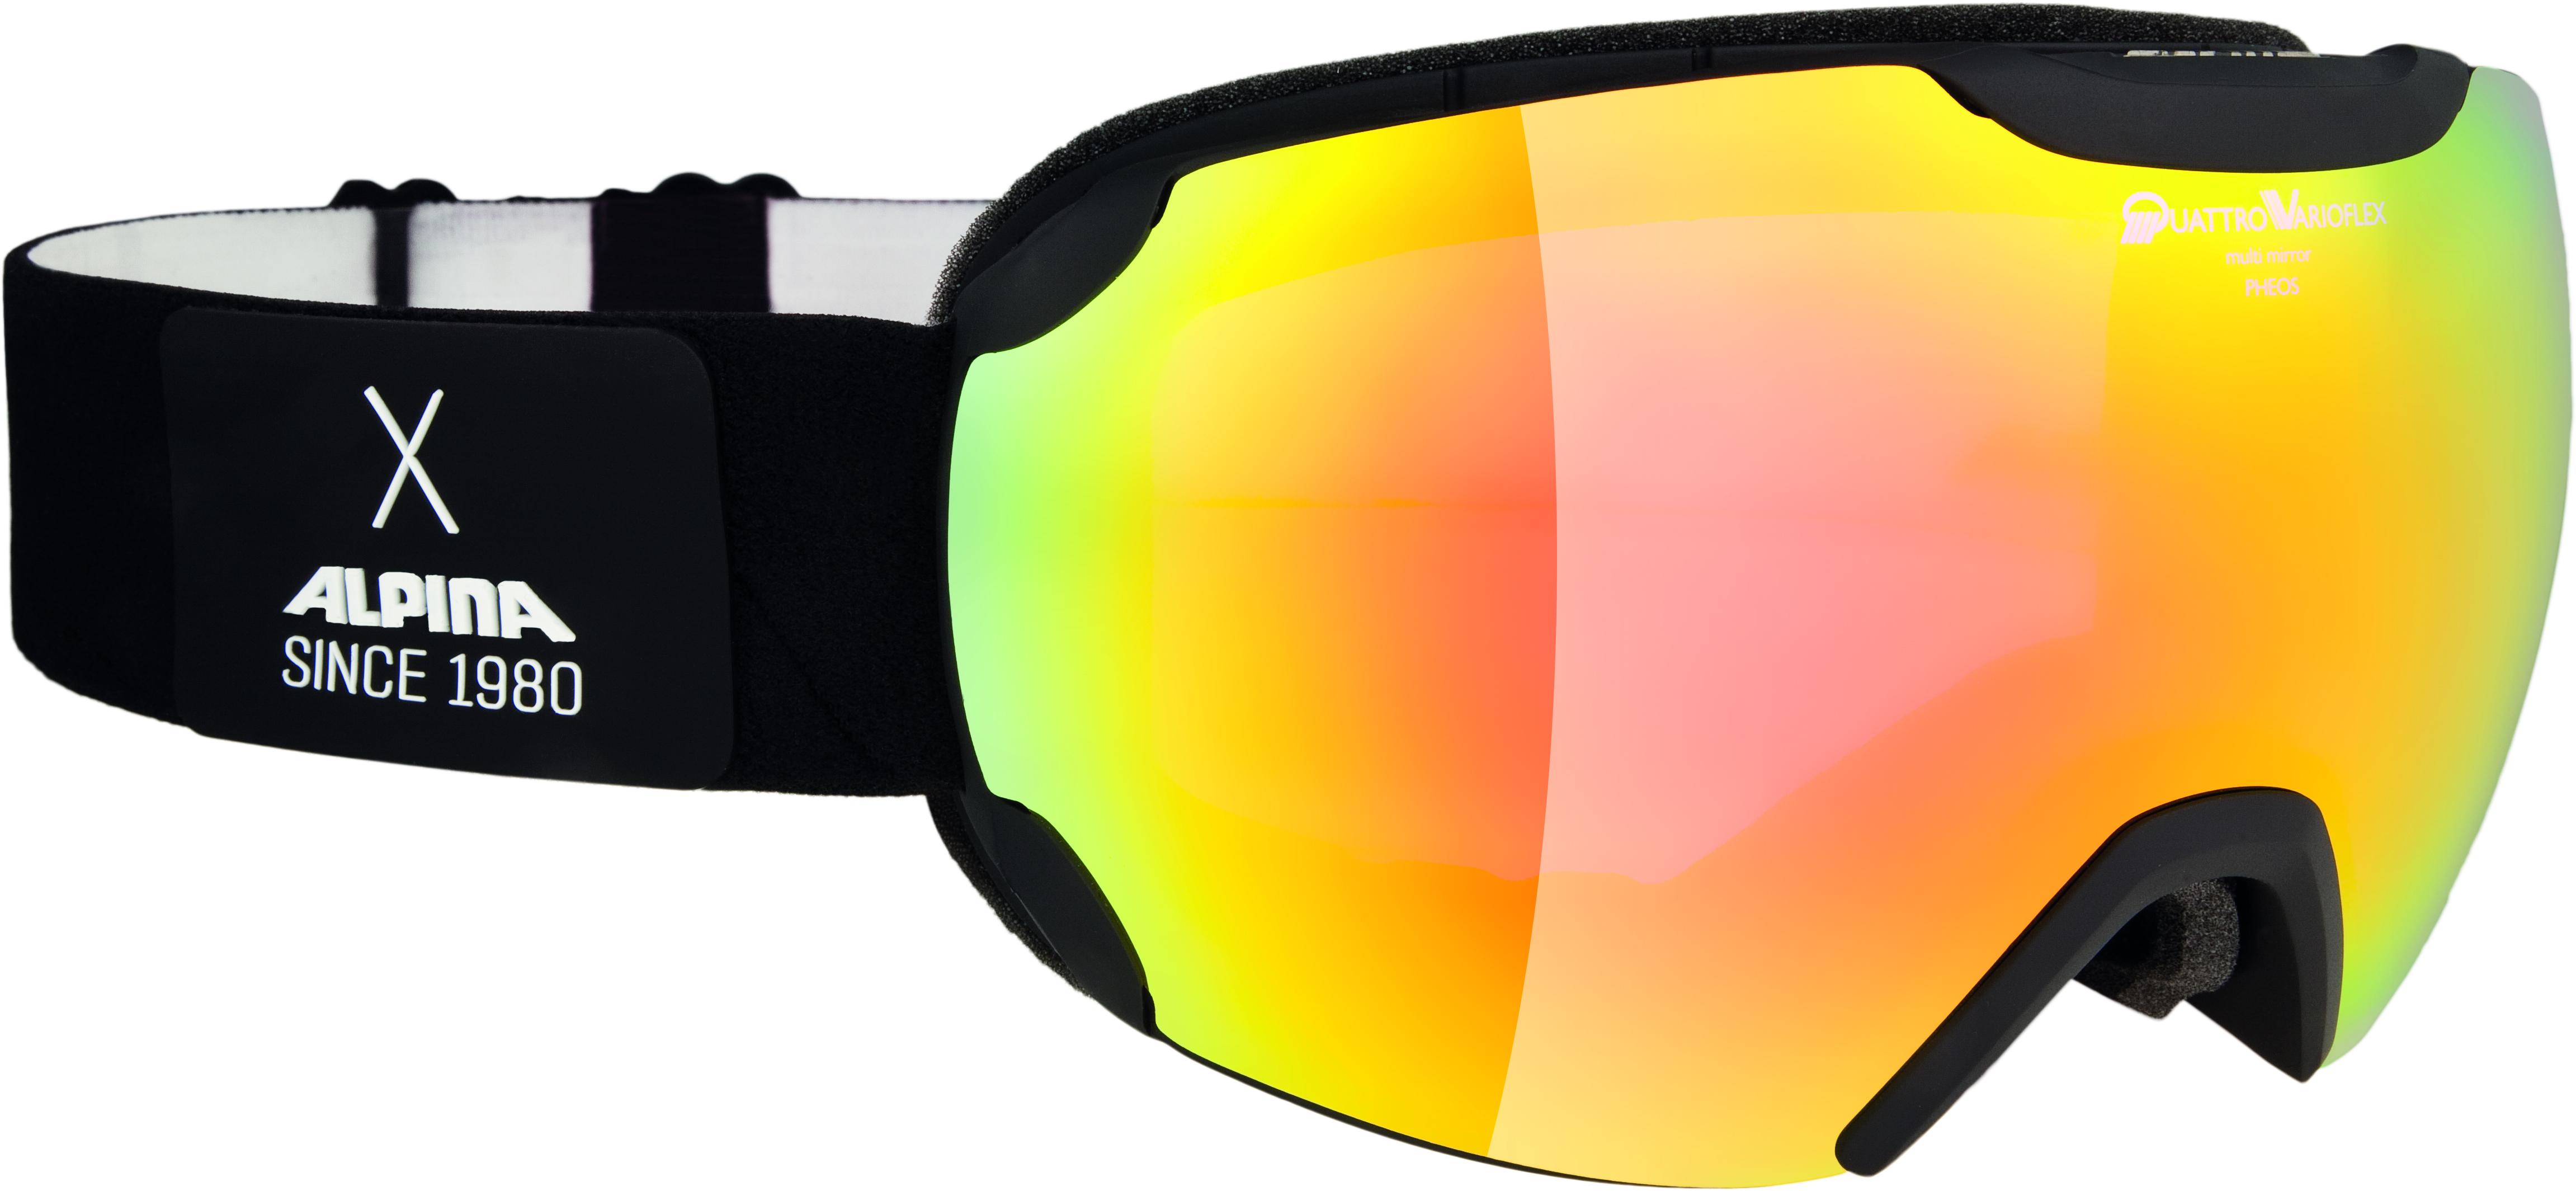 Купить Очки горнолыжные Alpina PHEOS QVMM black matt QV MM red sph. S2 / QV MM red sph. S2 (L50)